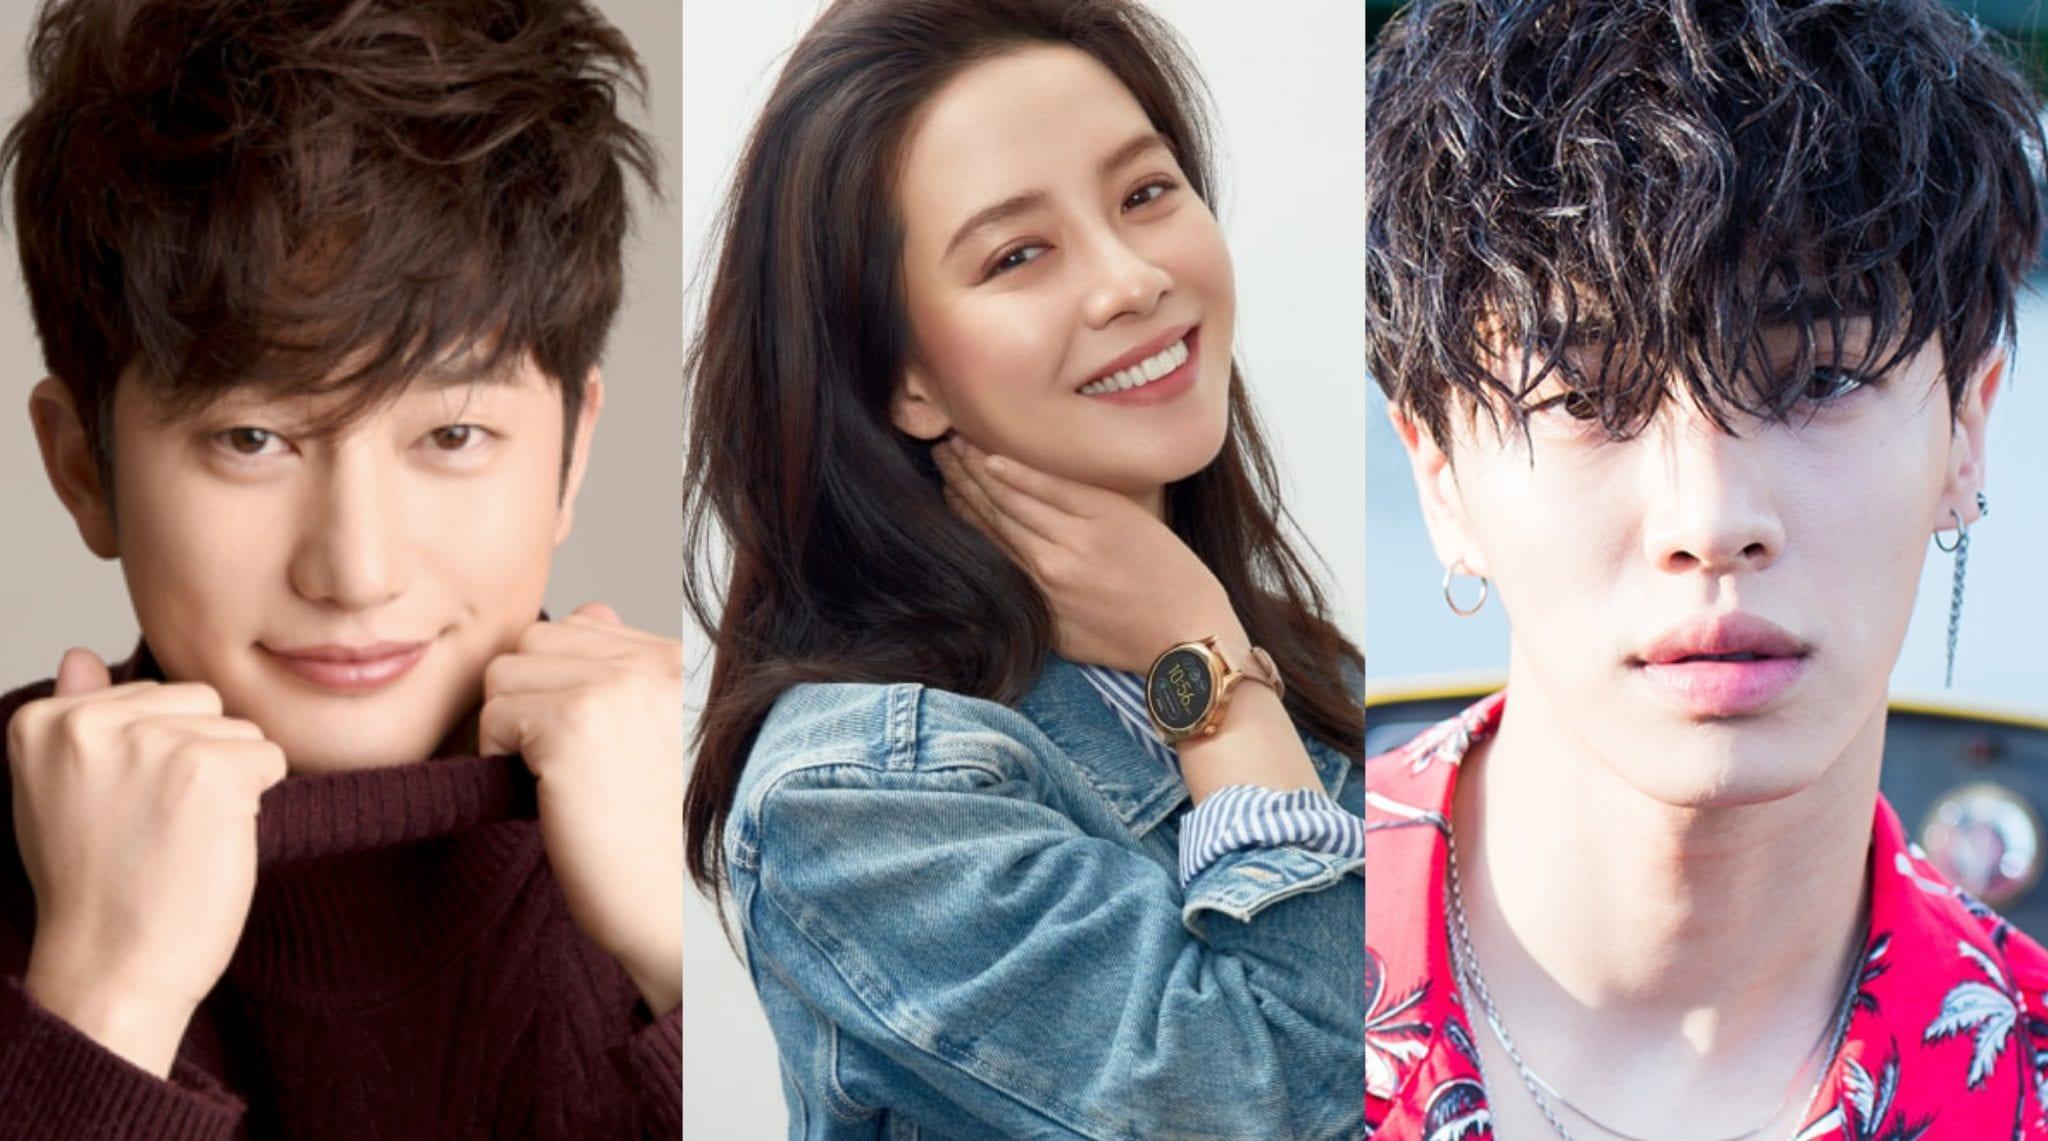 Song Ji Hyo, Park Shi Hoo & Kikwang All Confirmed For New KBS Drama